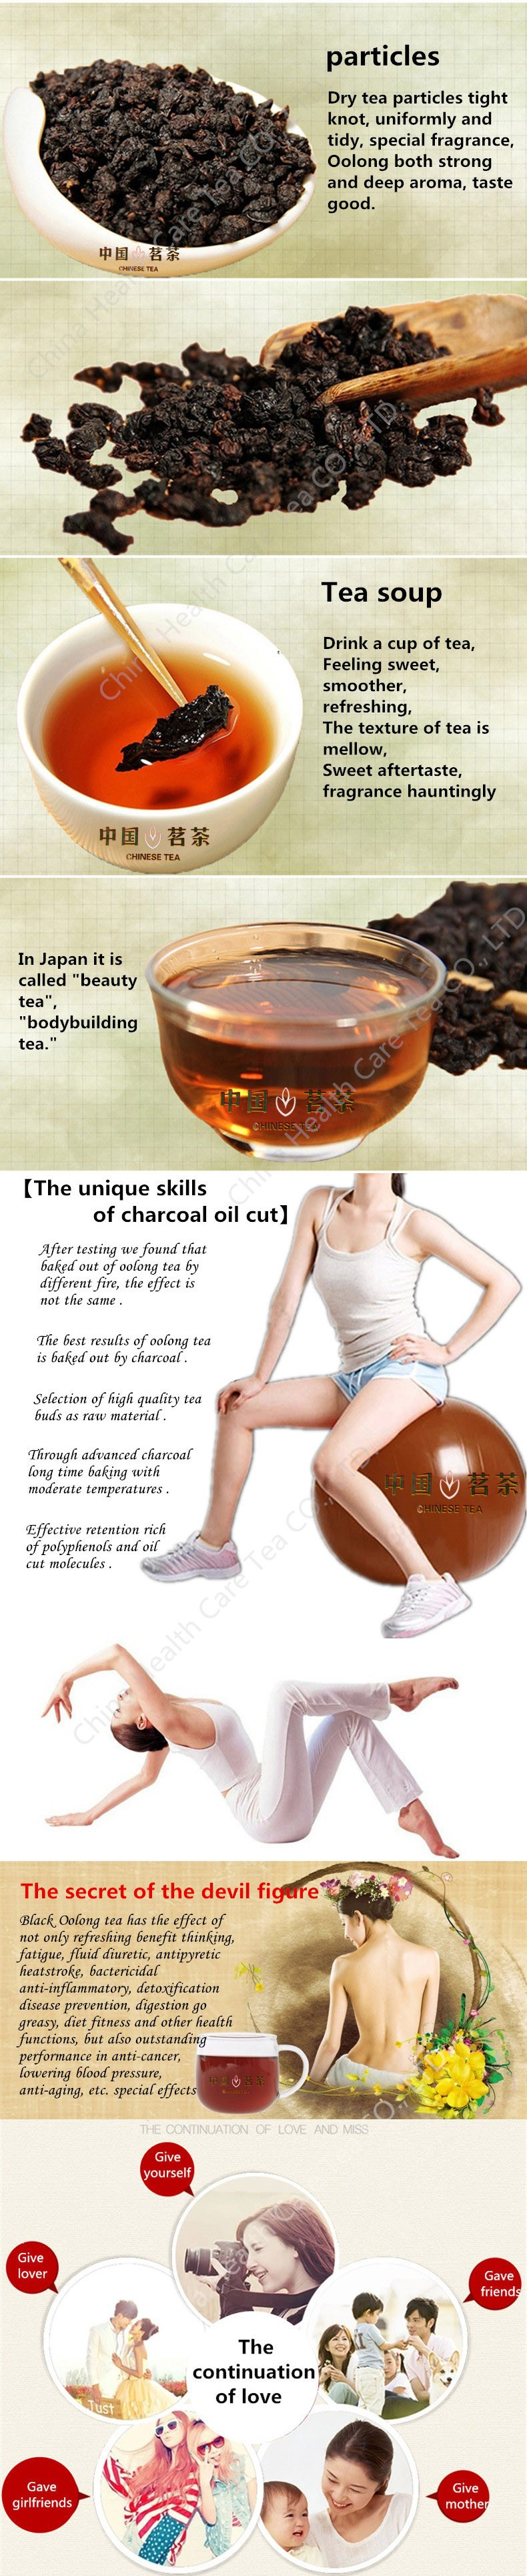 C-WL044 Chinese High Quality Oil Cut Black Oolong Tea 250g Fresh Natural Weight Loss Tea High Cost-effective Slimming Tea